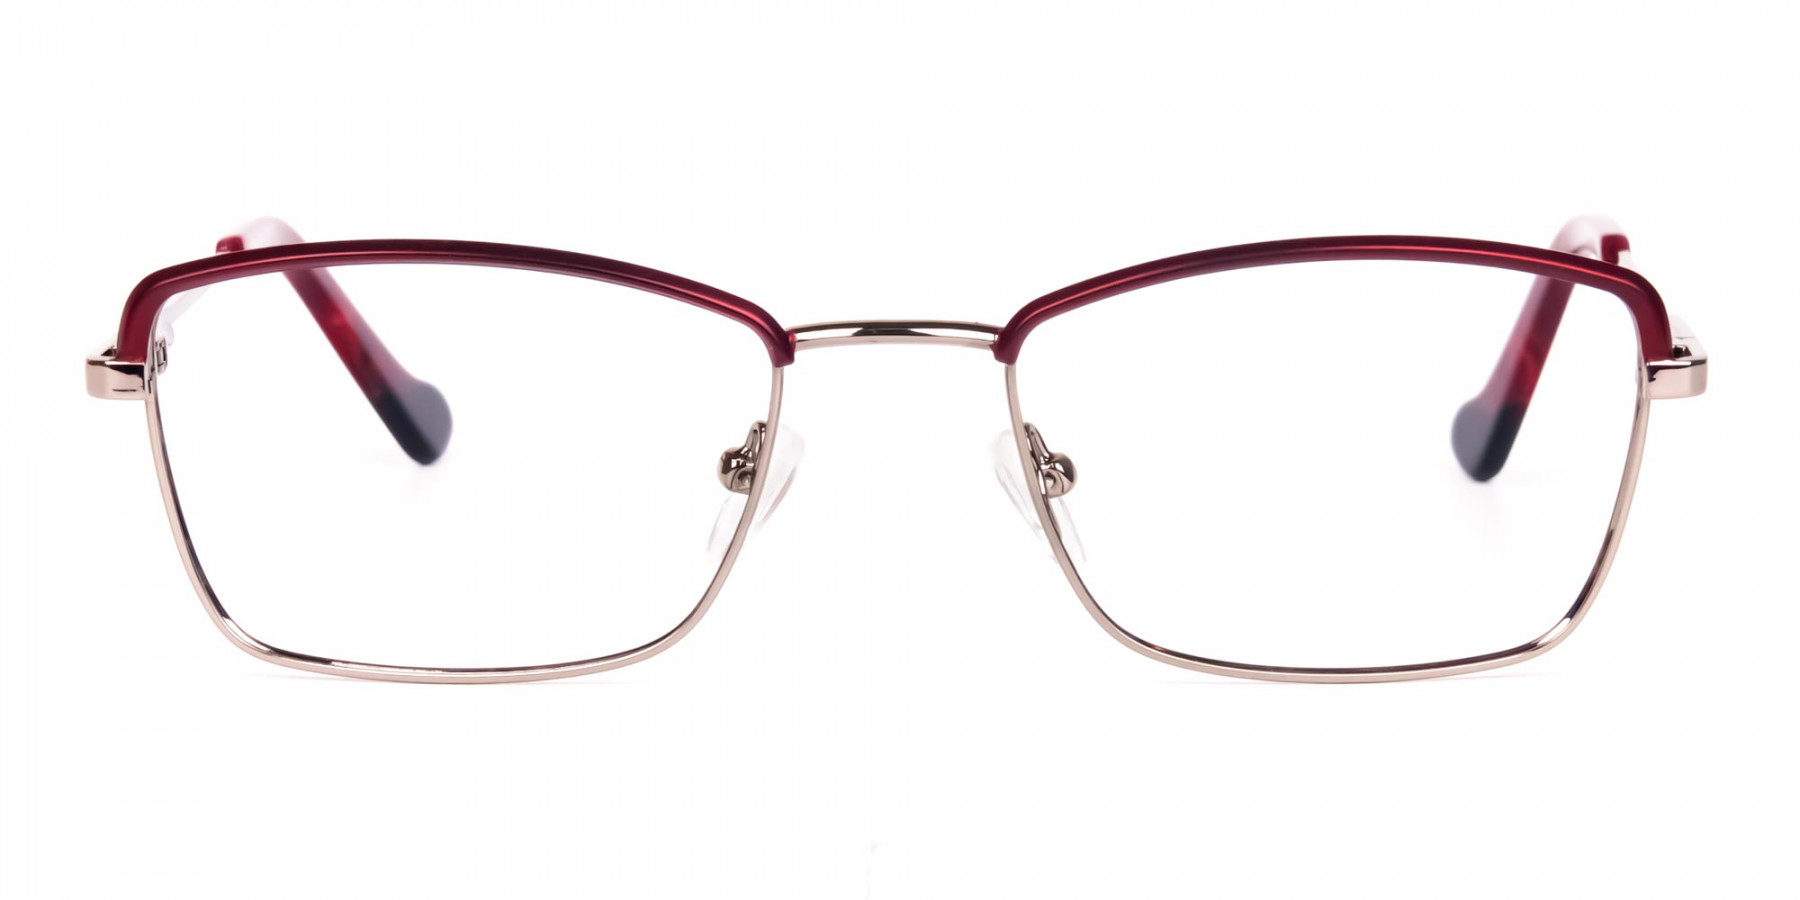 blue light glasses metal frame-1